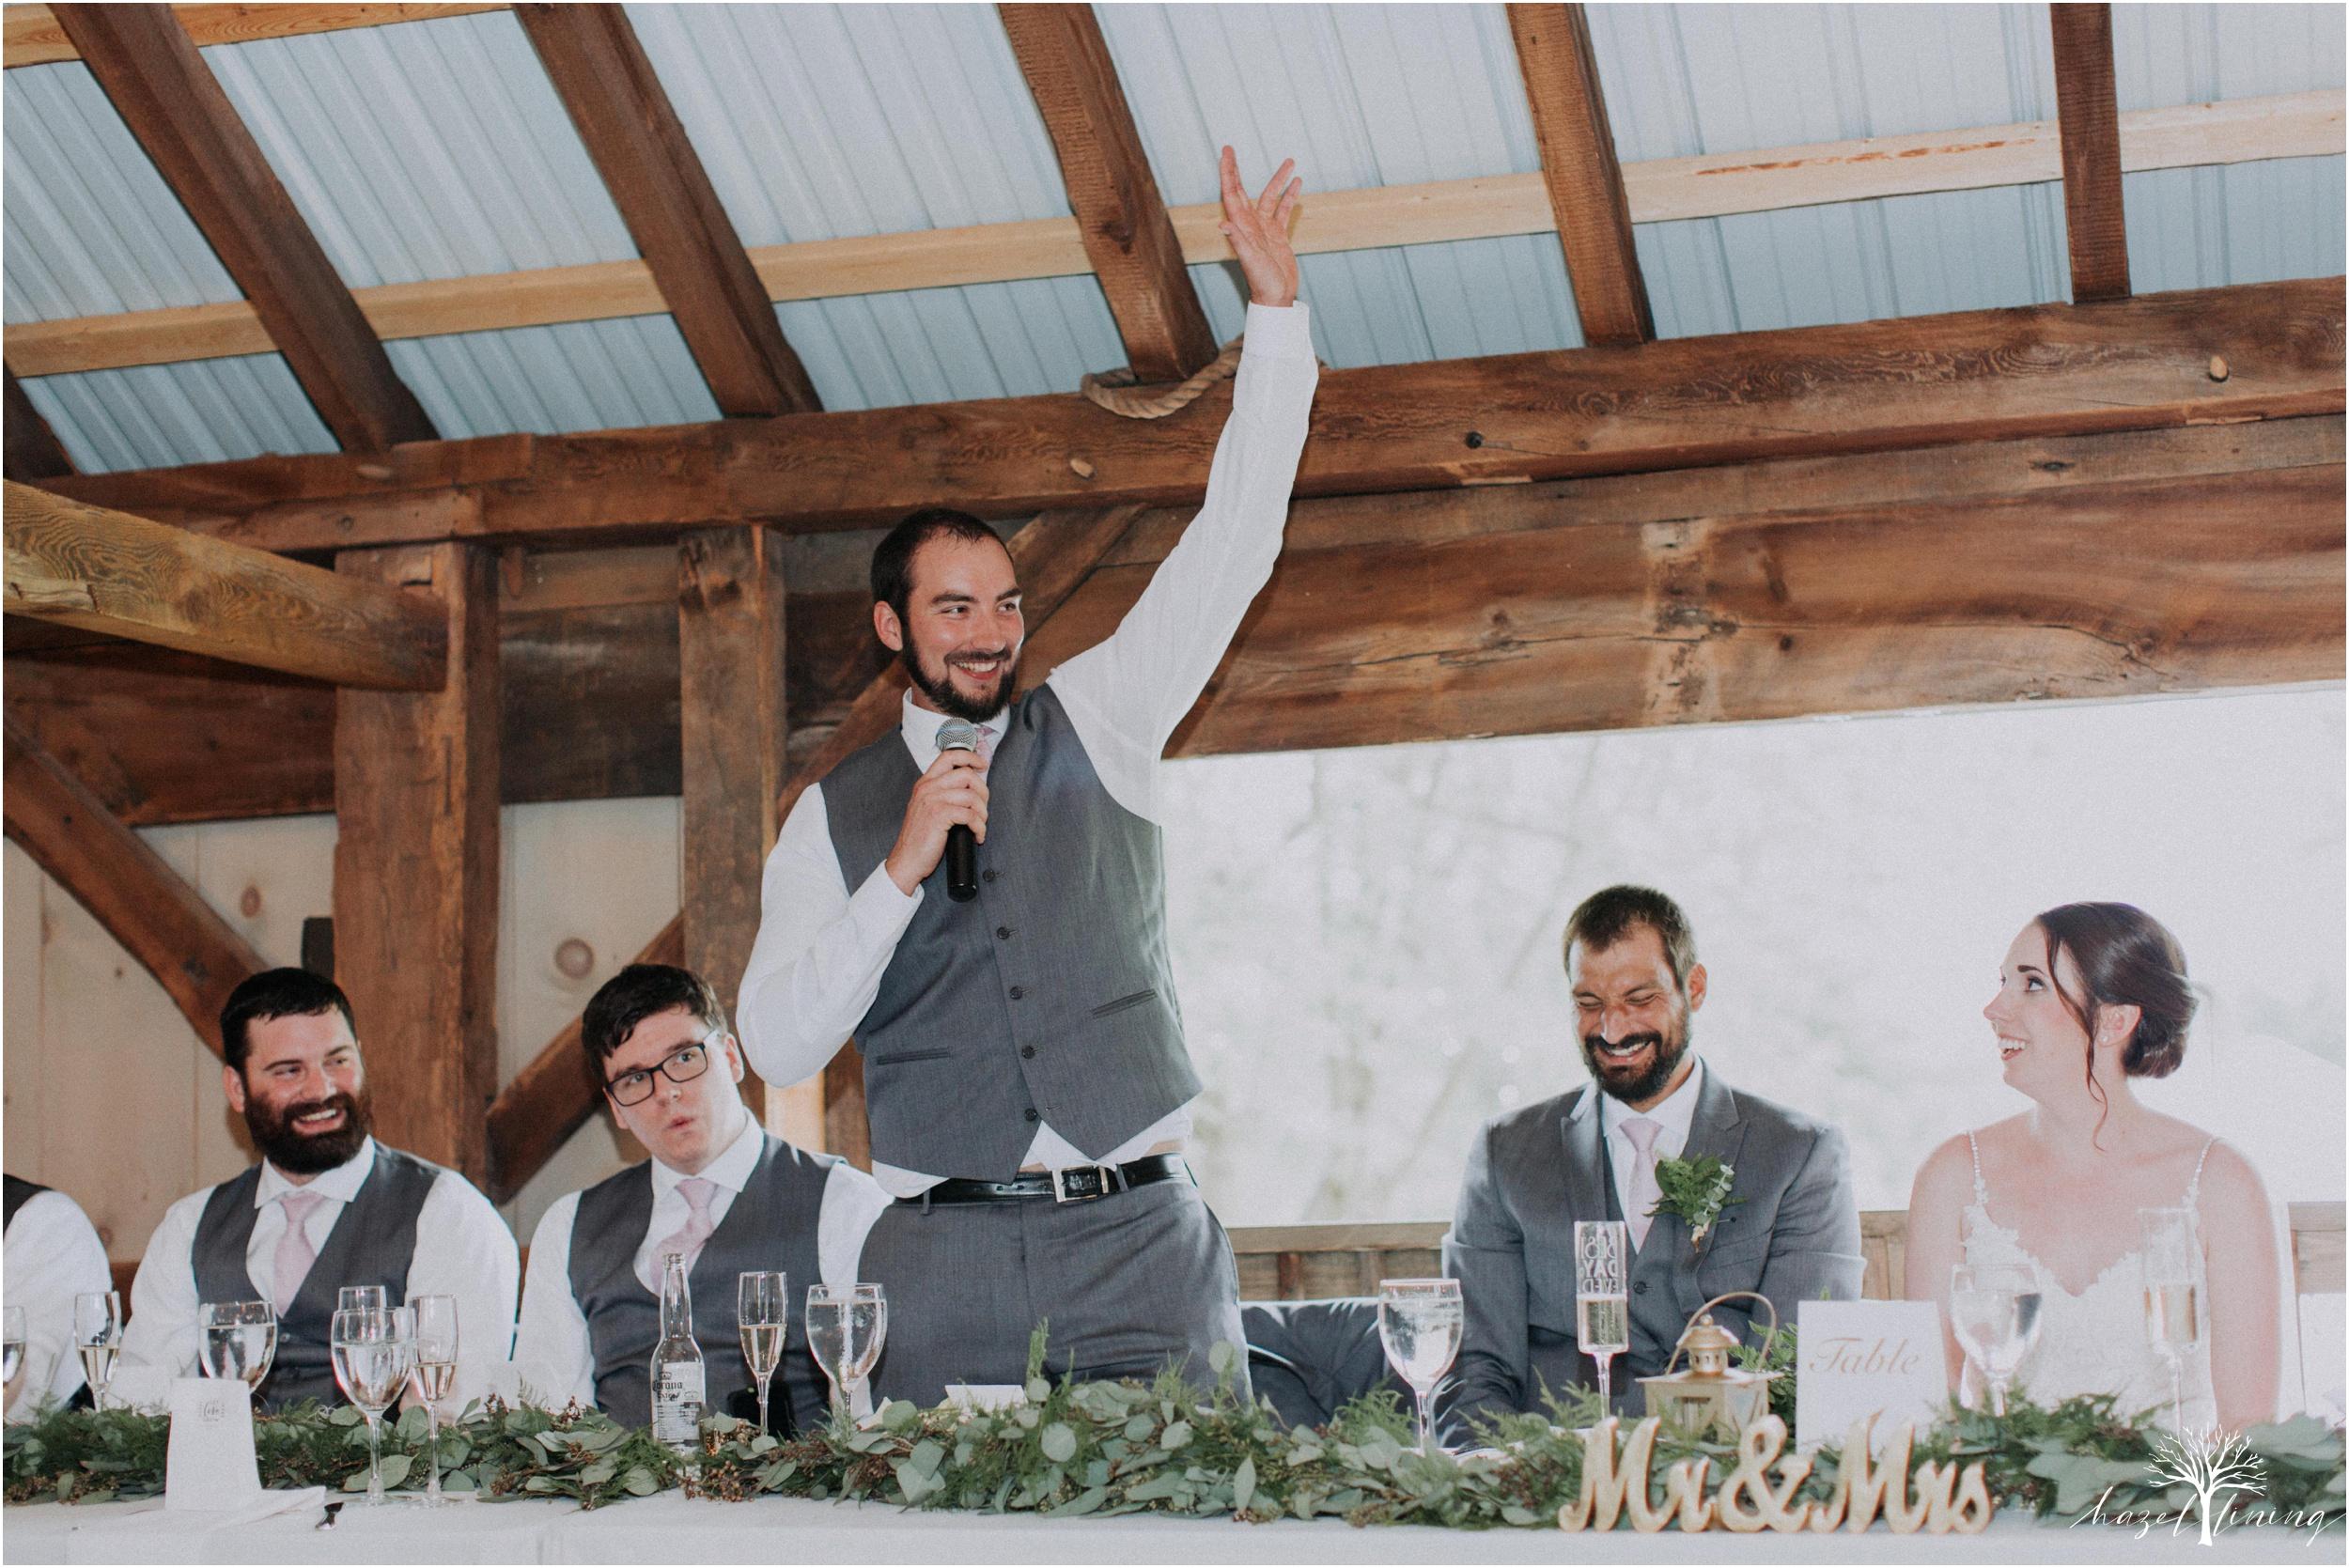 hazel-lining-travel-wedding-elopement-photography-lisa-landon-shoemaker-the-farm-bakery-and-events-bucks-county-quakertown-pennsylvania-summer-country-outdoor-farm-wedding_0125.jpg